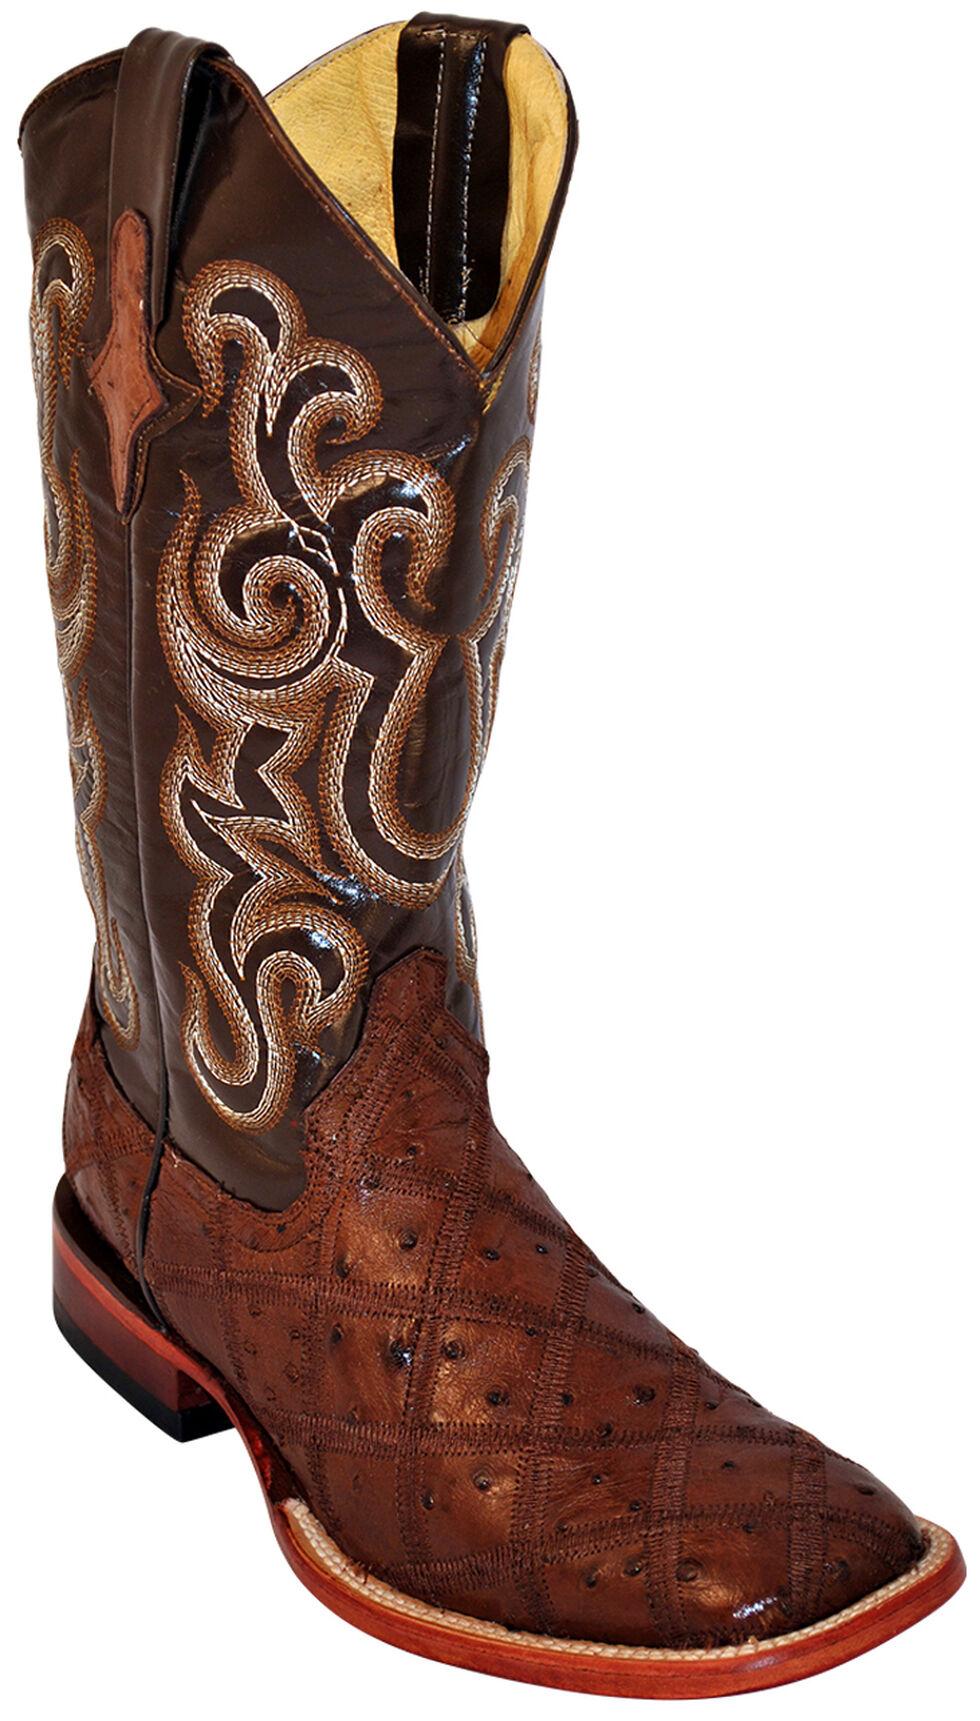 Ferrini Ostrich Patchwork Exotic Western Boots - Square Toe , Kango, hi-res